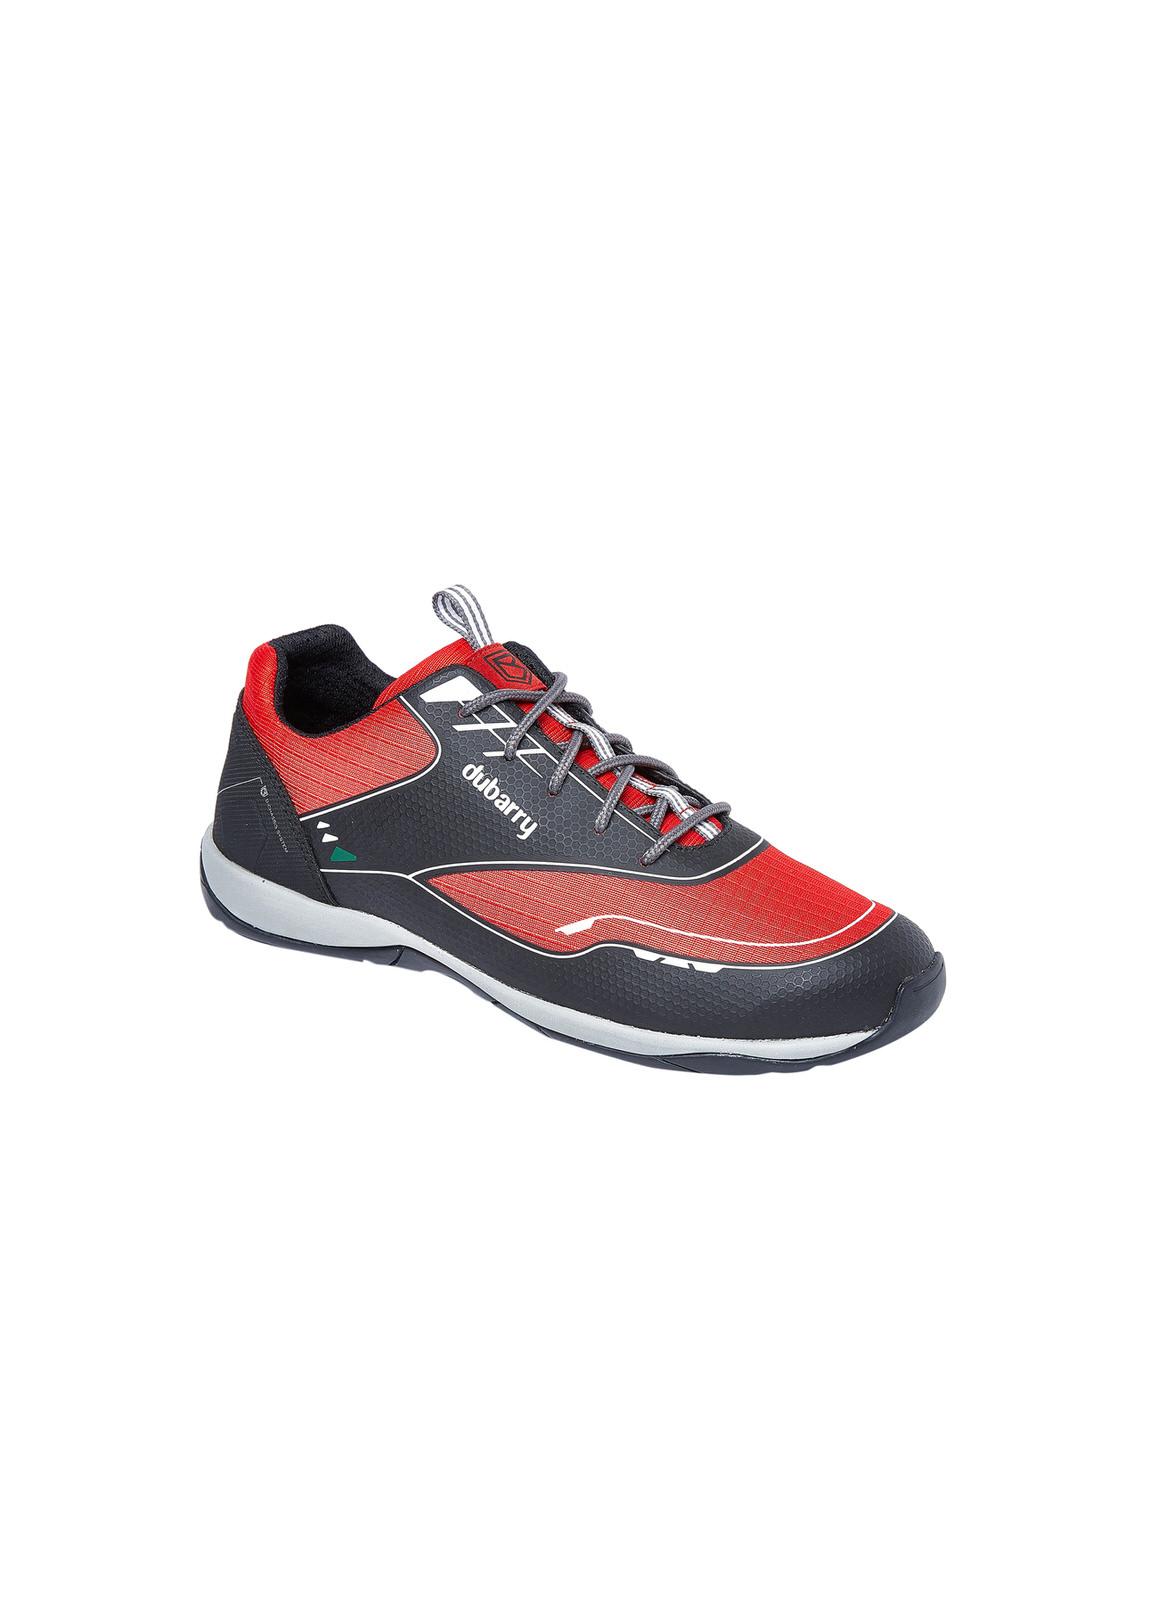 Racer Aquasport Shoe - Red